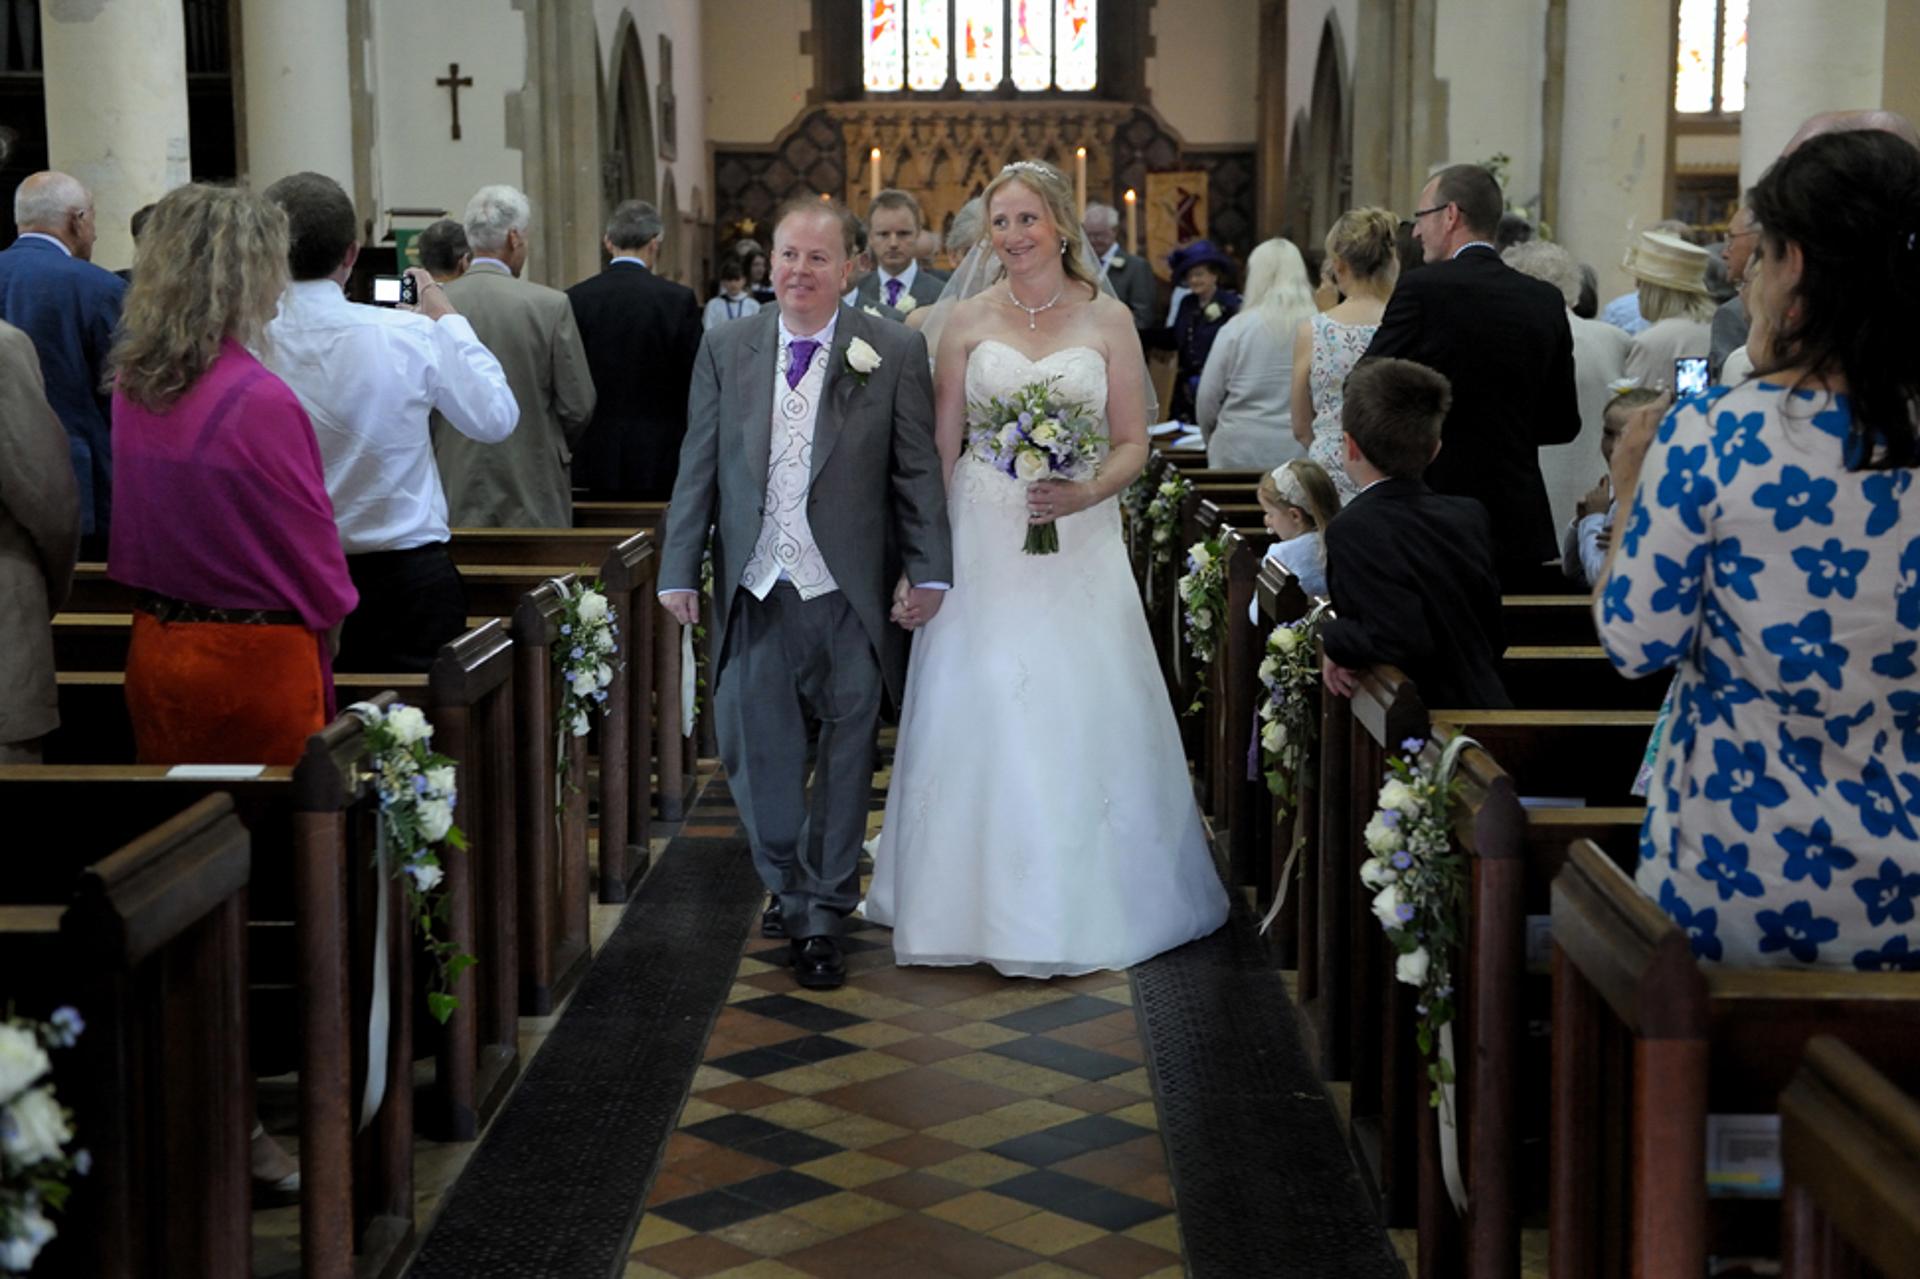 Cantley House Wedding photography_06.JPG